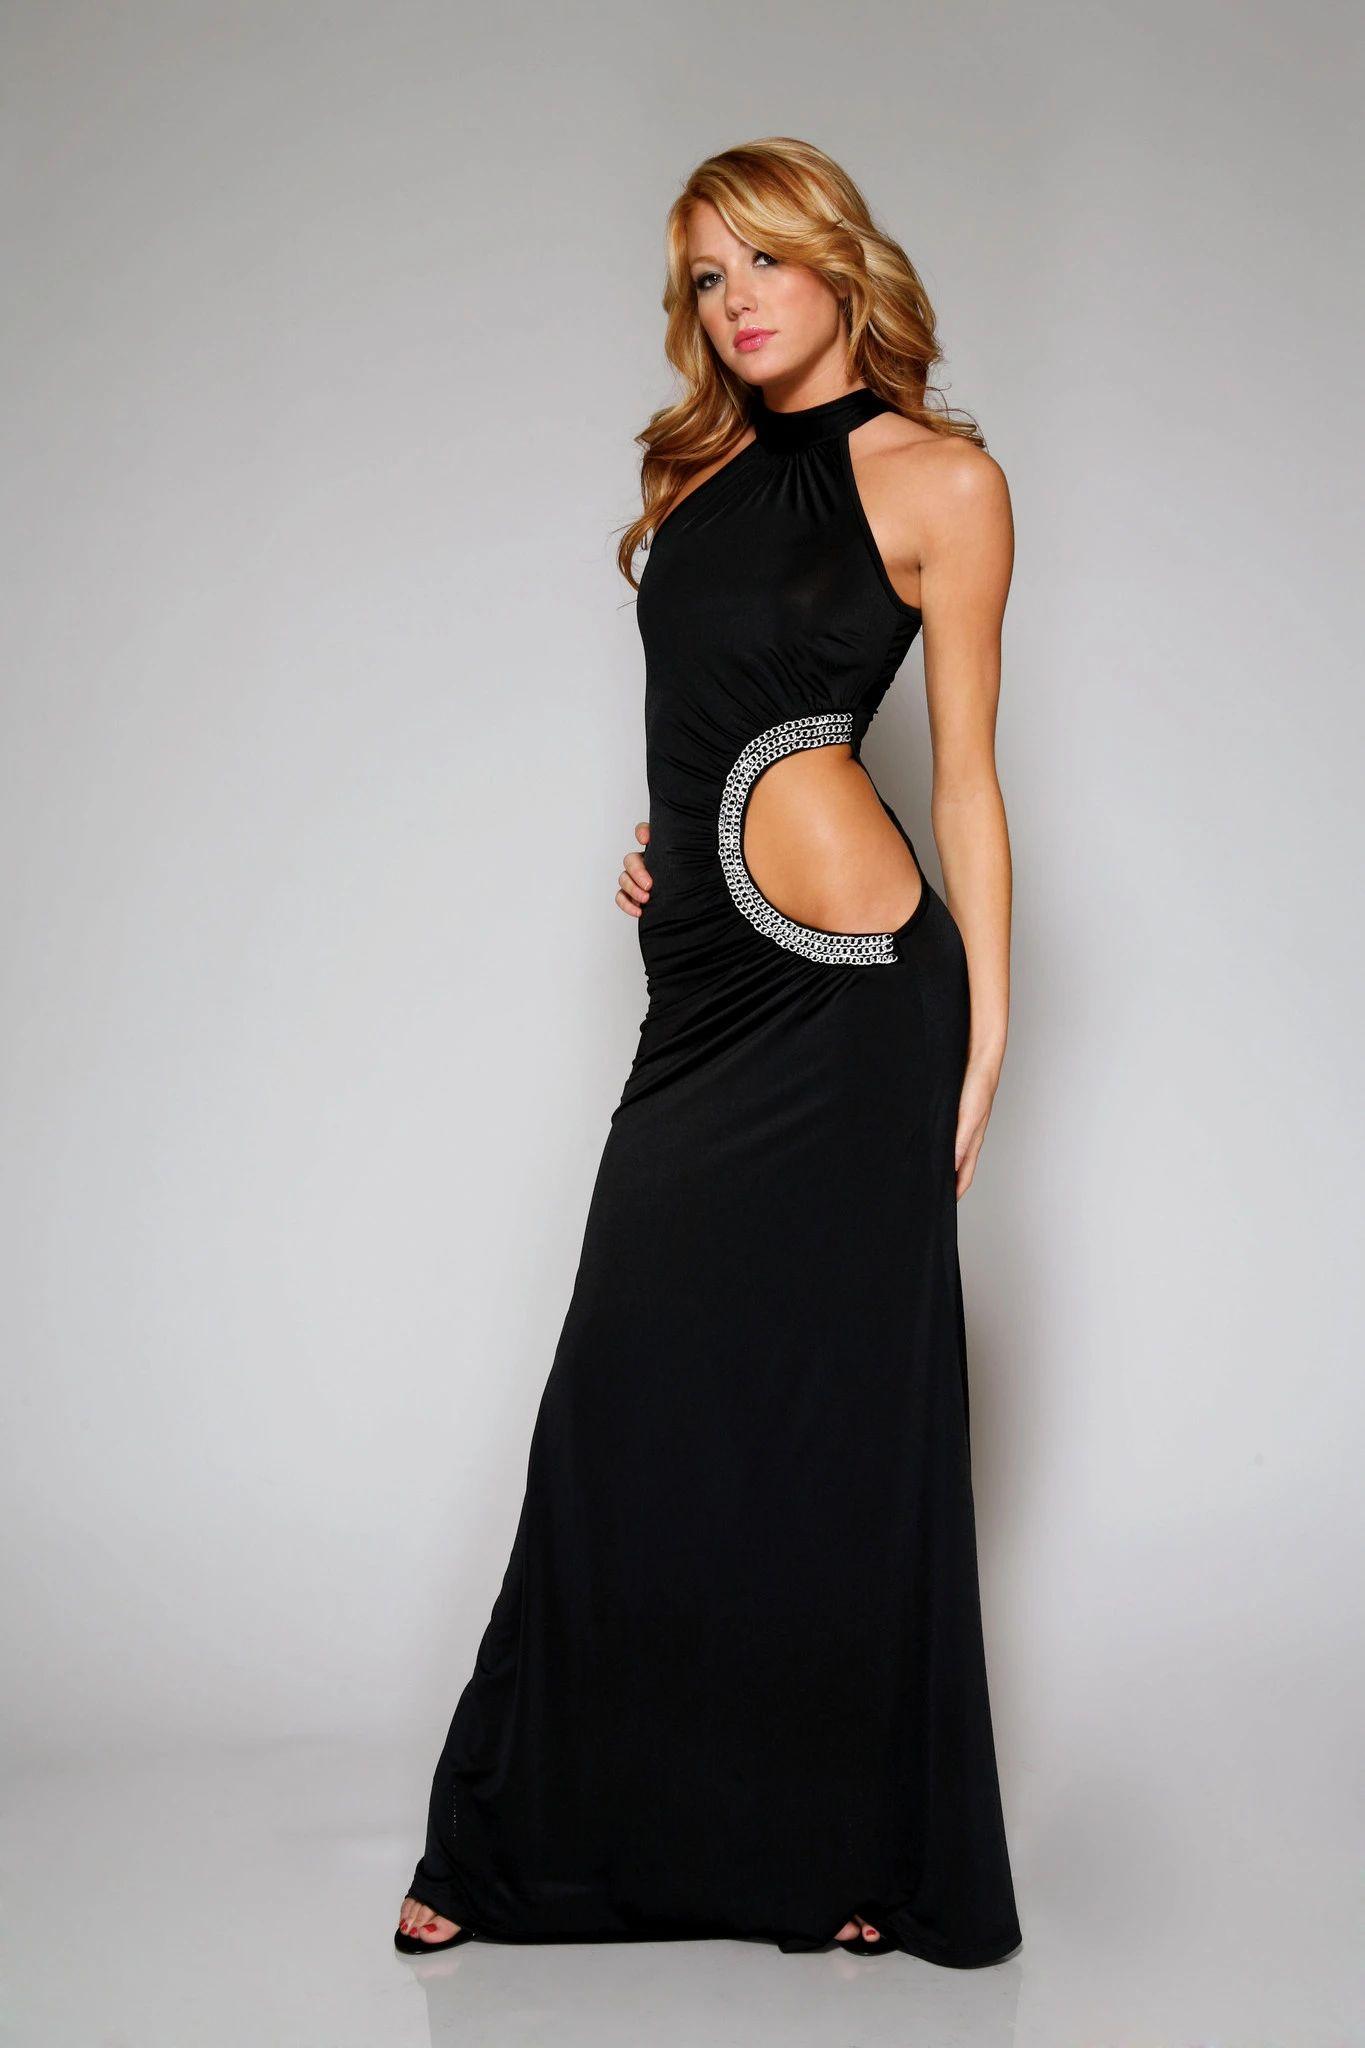 Cut-out Side Chain Detail Long Dress Black